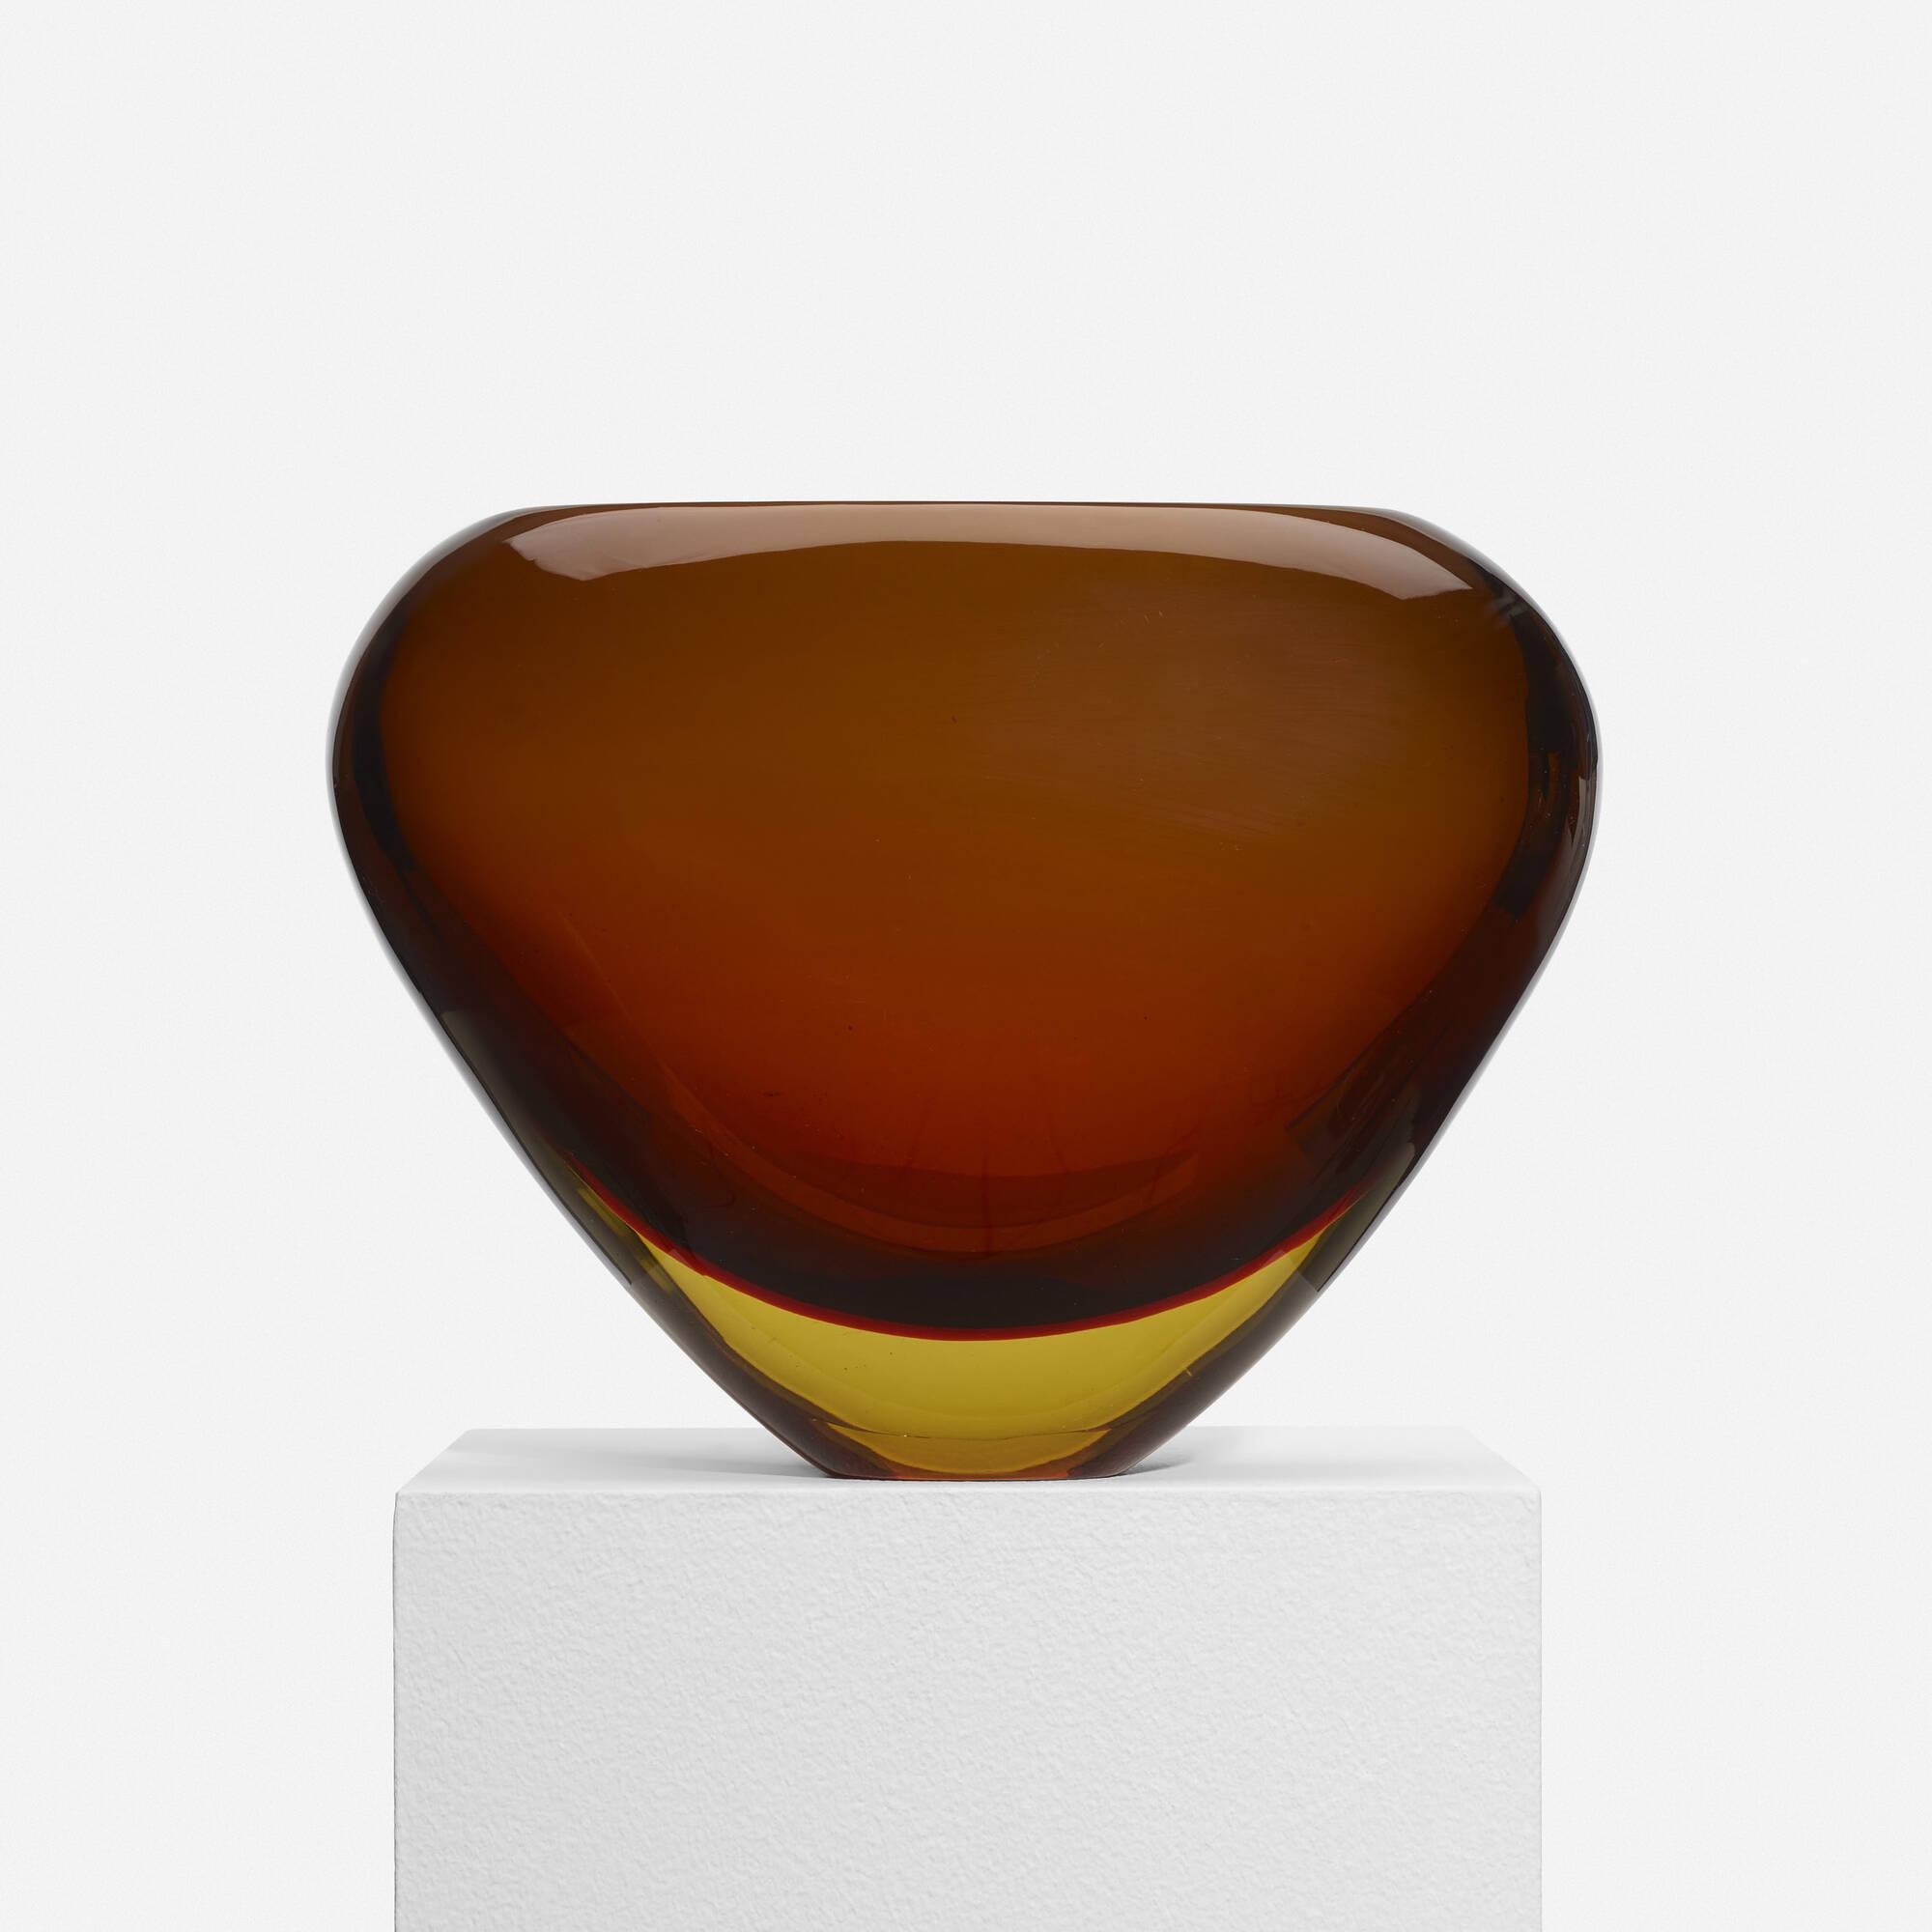 221: Flavio Poli / Sommerso vase, model 12890 (2 of 4)